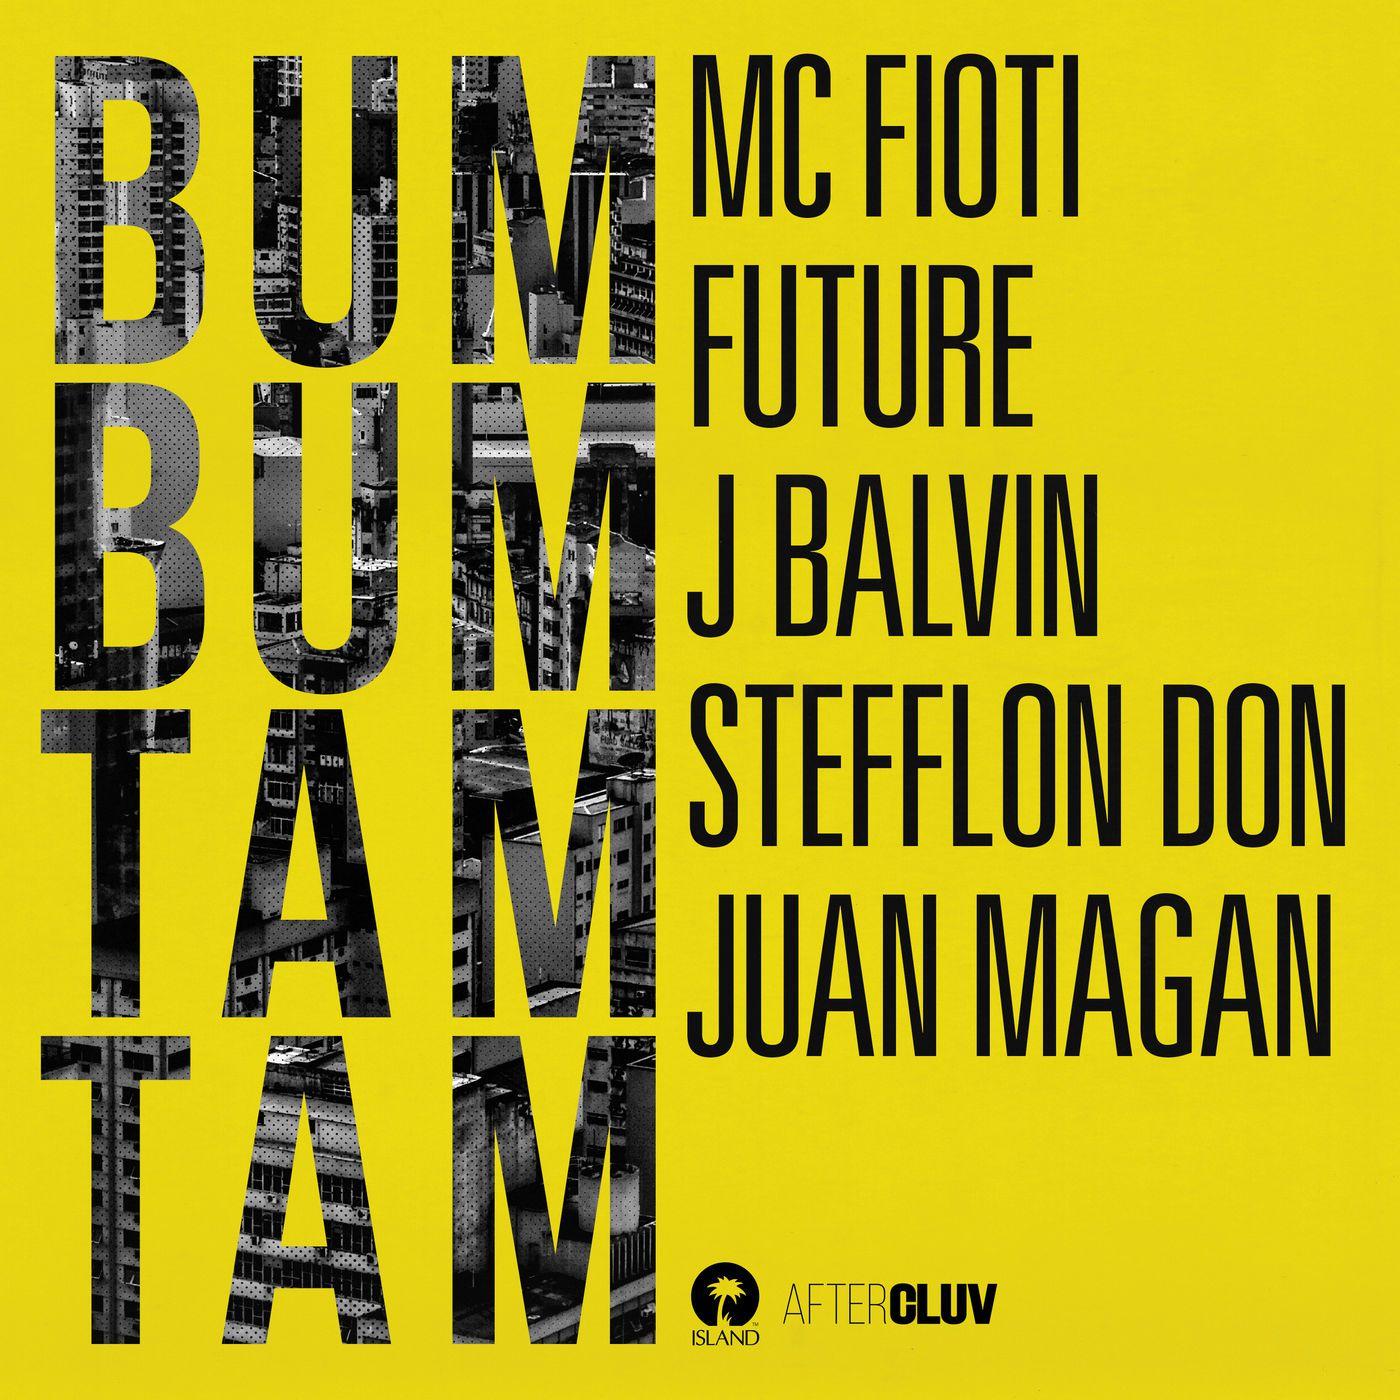 Mc Fioti Bum Bum Tam Tam Download 2: Mc Fioti, Future, J Balvin, Stefflon Don & Juan Magan